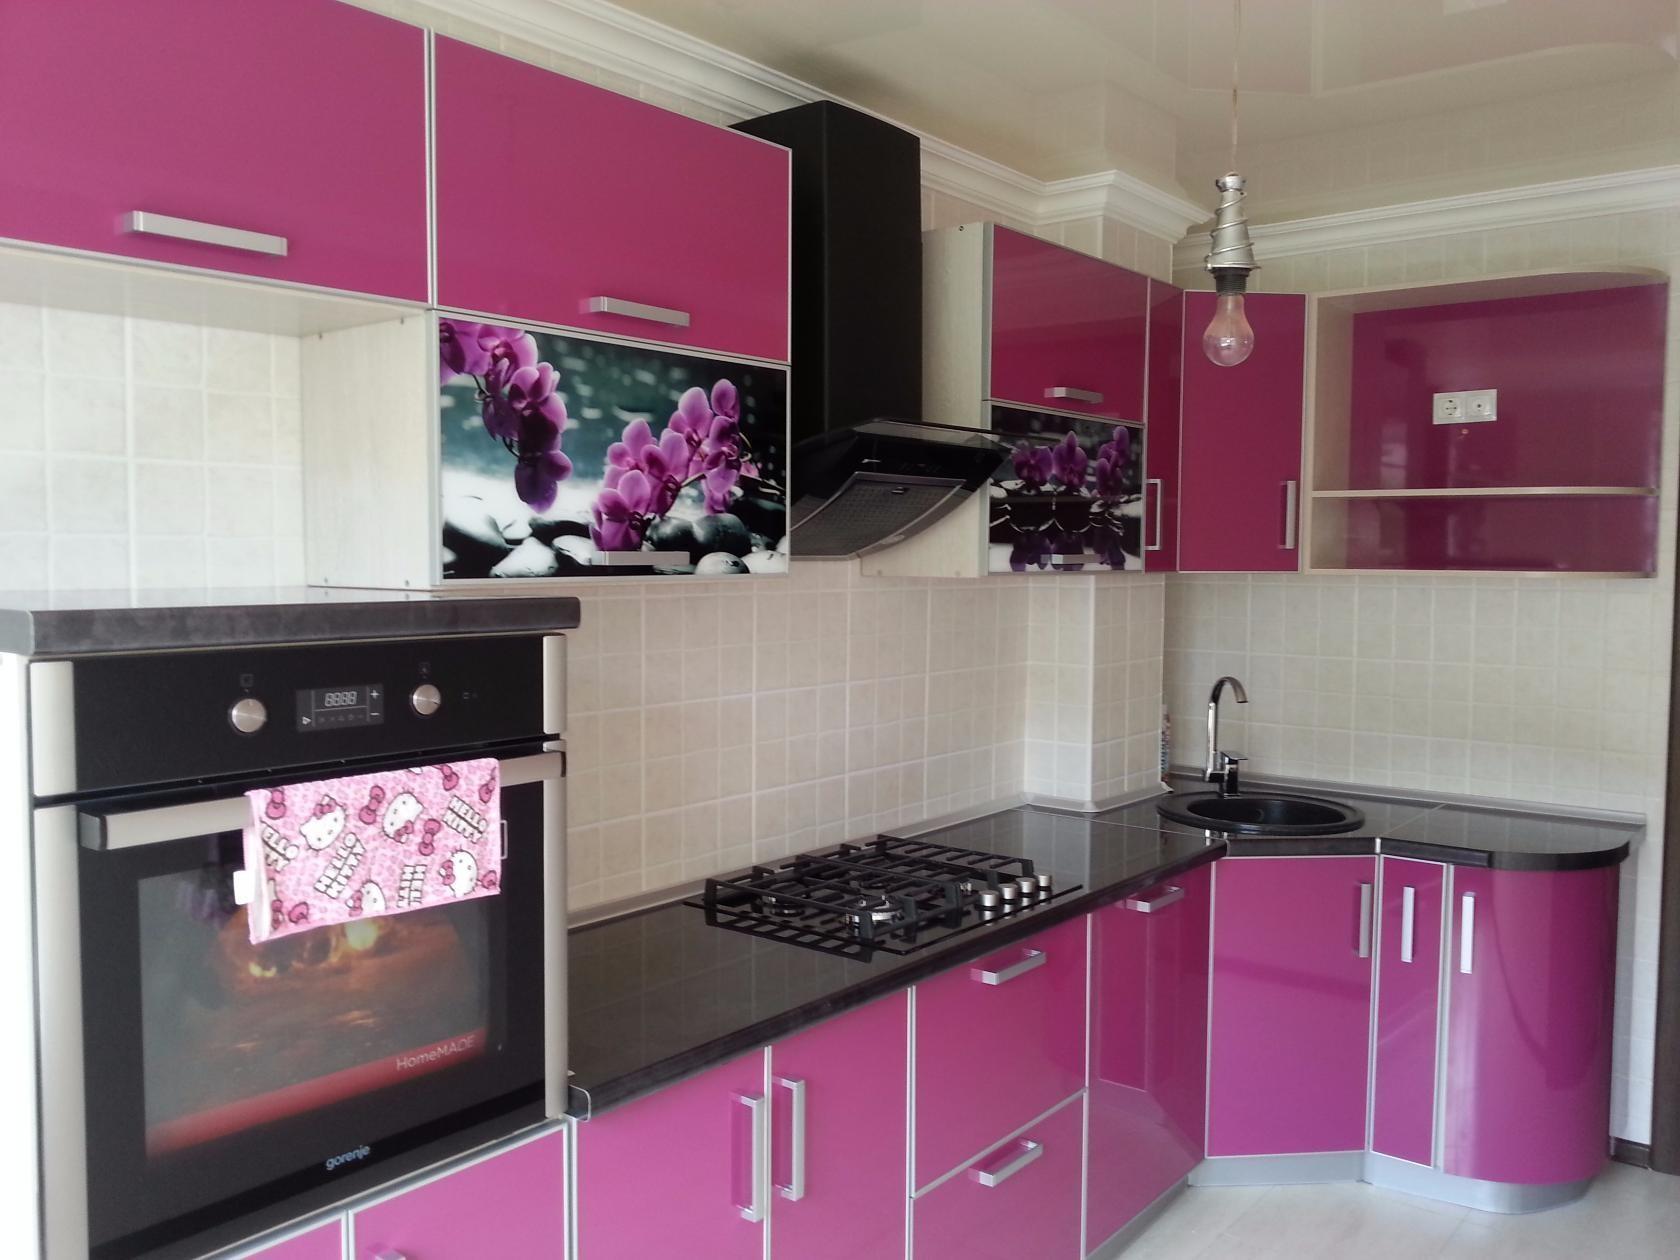 забудьте фото кухонь розового цвета торт пластиковую